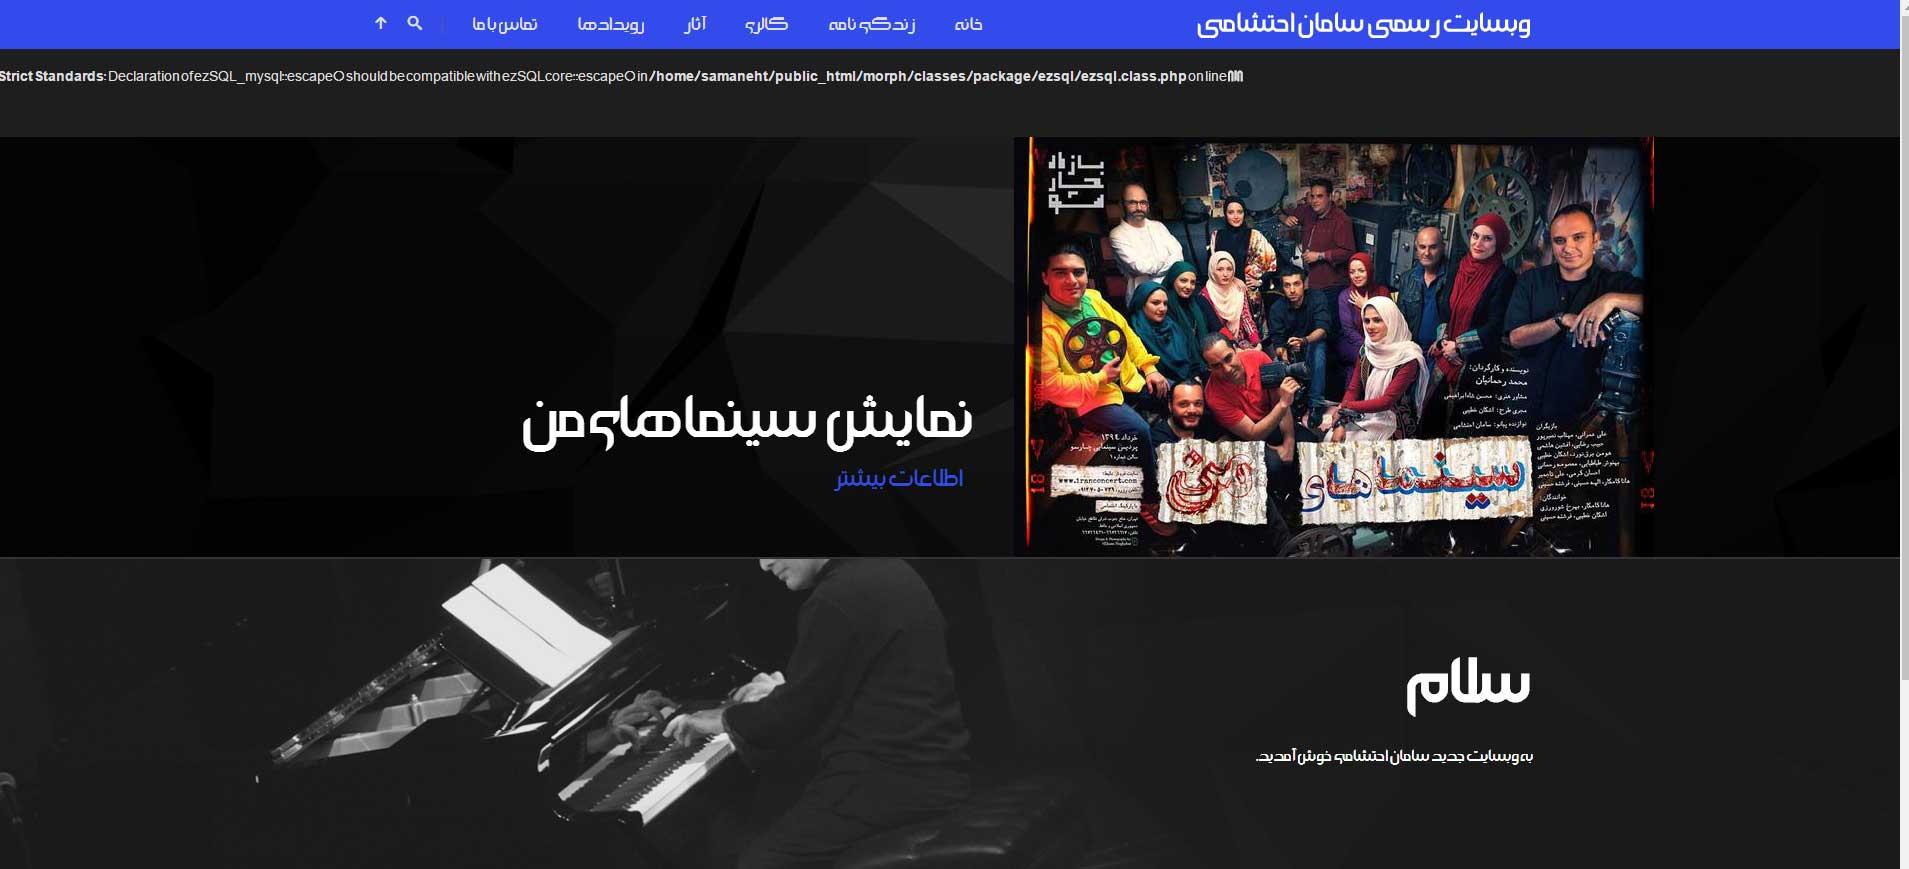 طراحی سایت سامان احتشامی